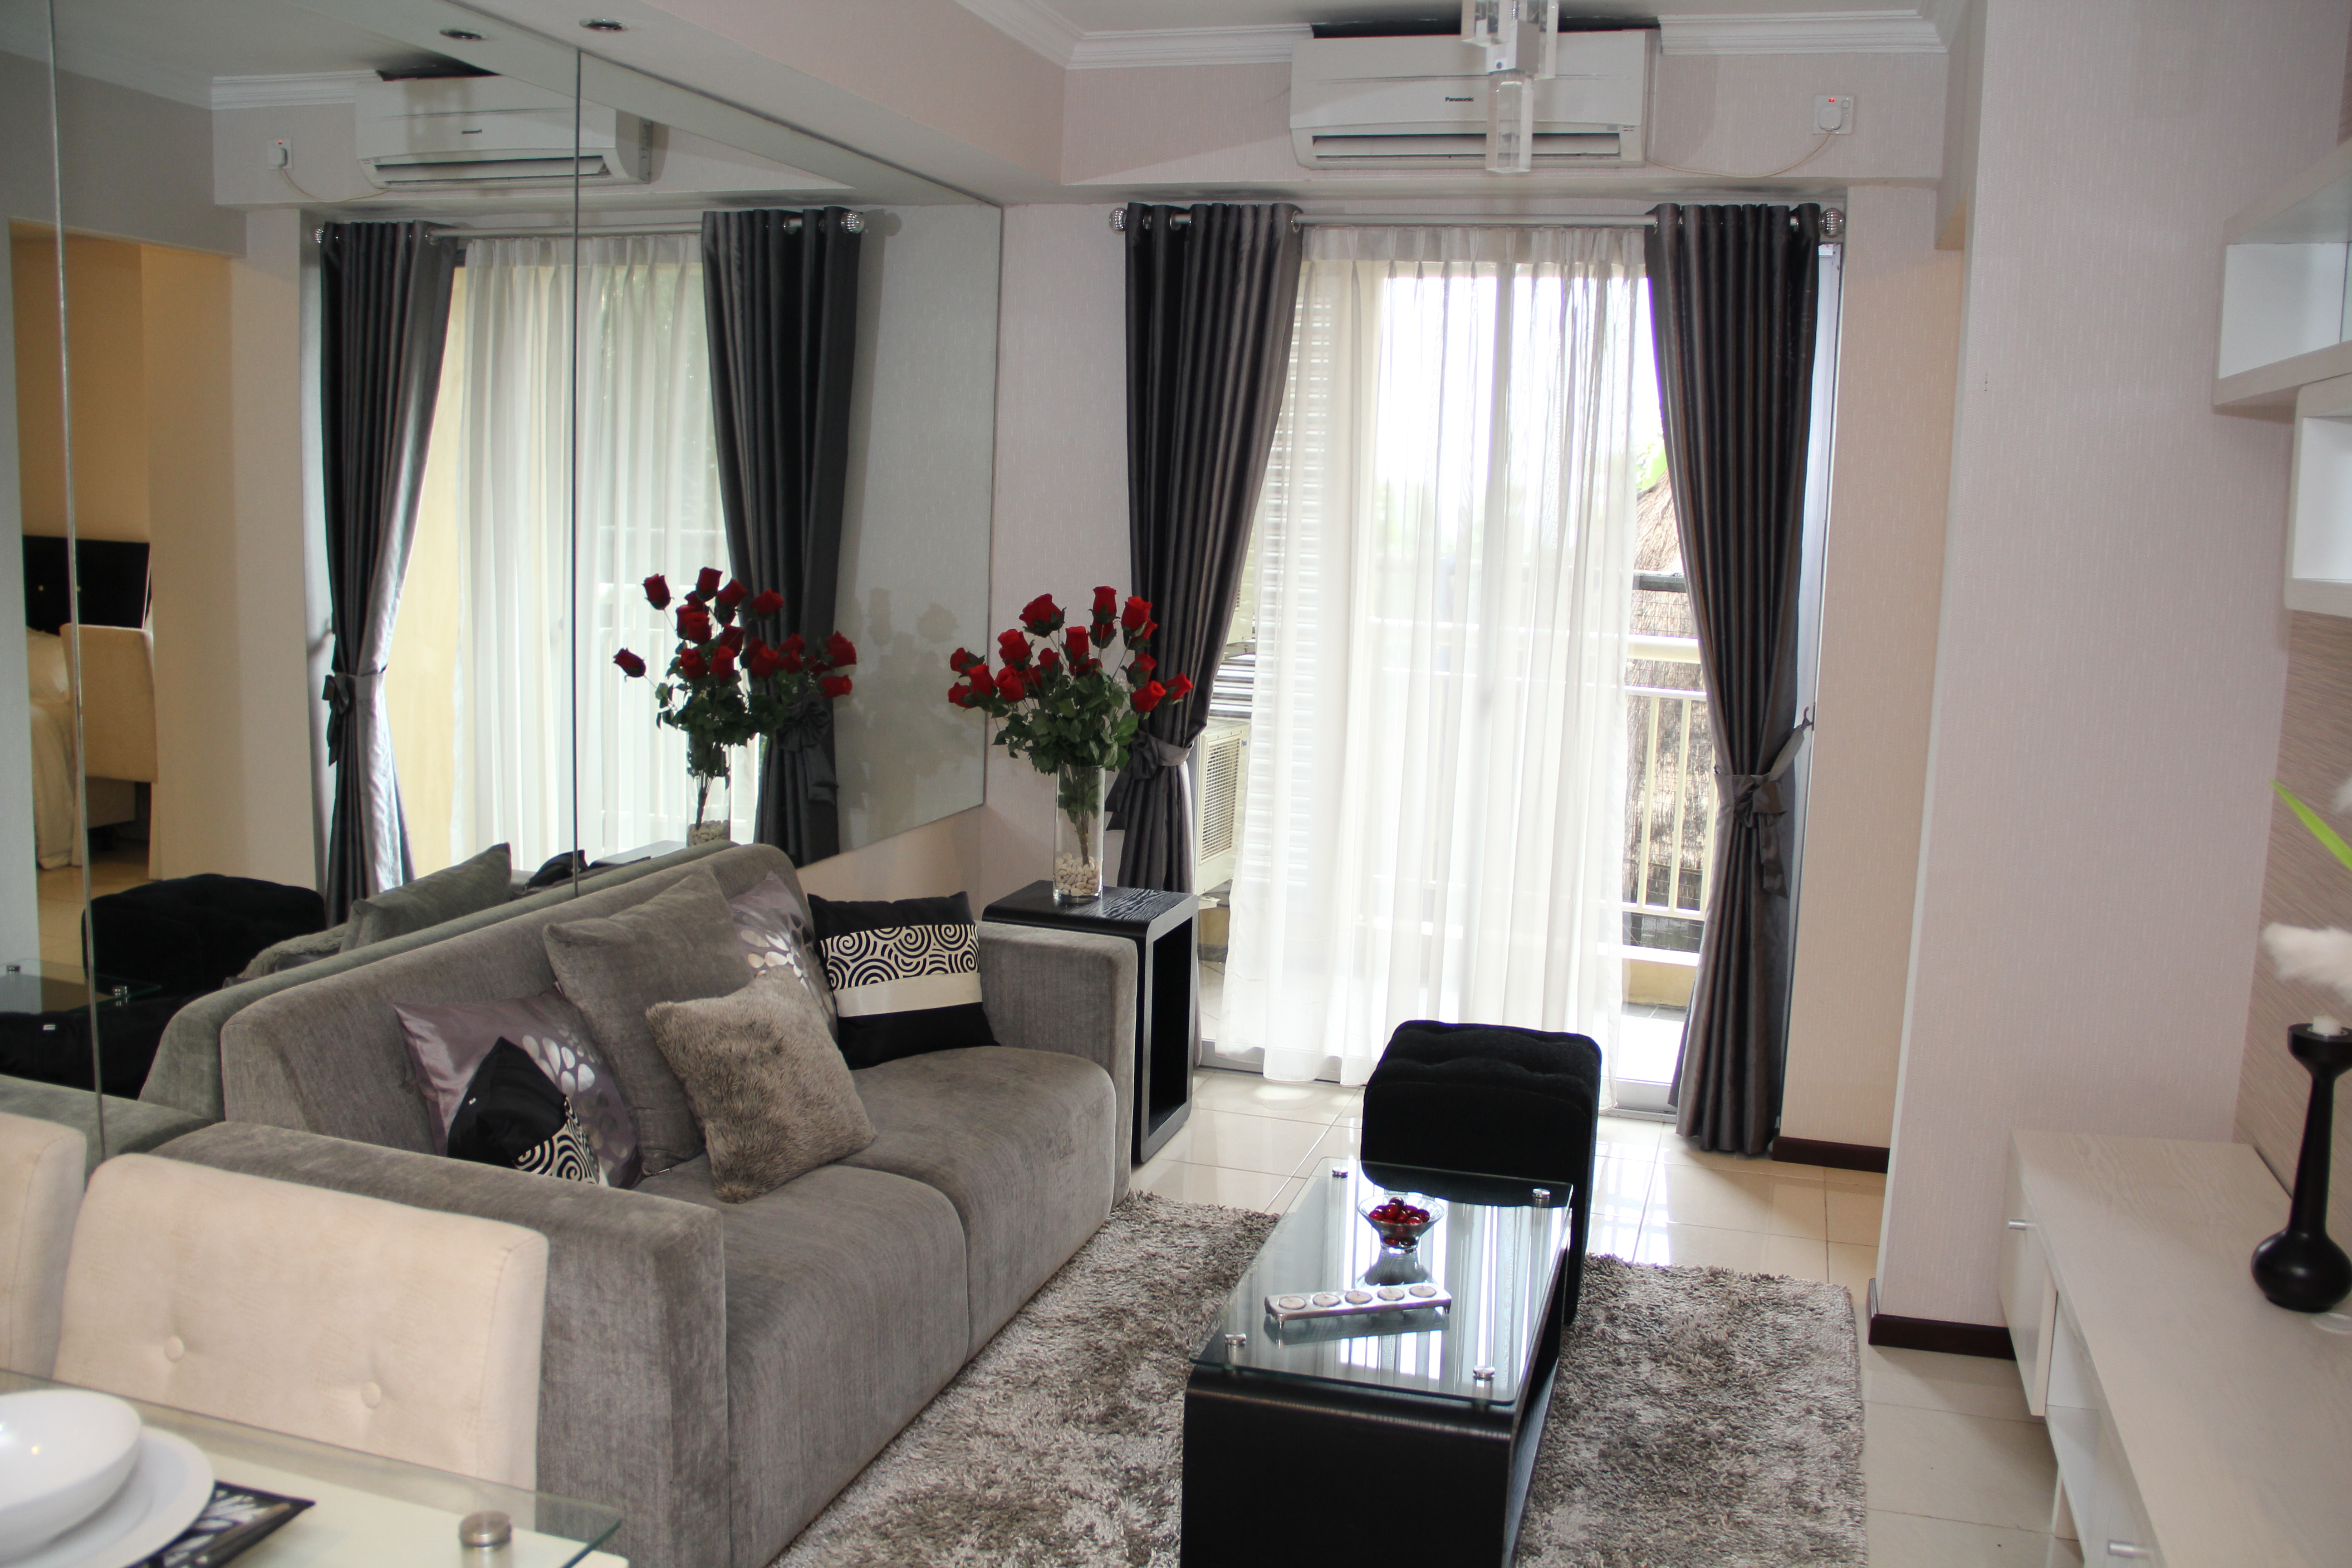 Great Western Resort - Tipe Bukhara - Hunian Yang Ready Stock, Comfortable & High Value